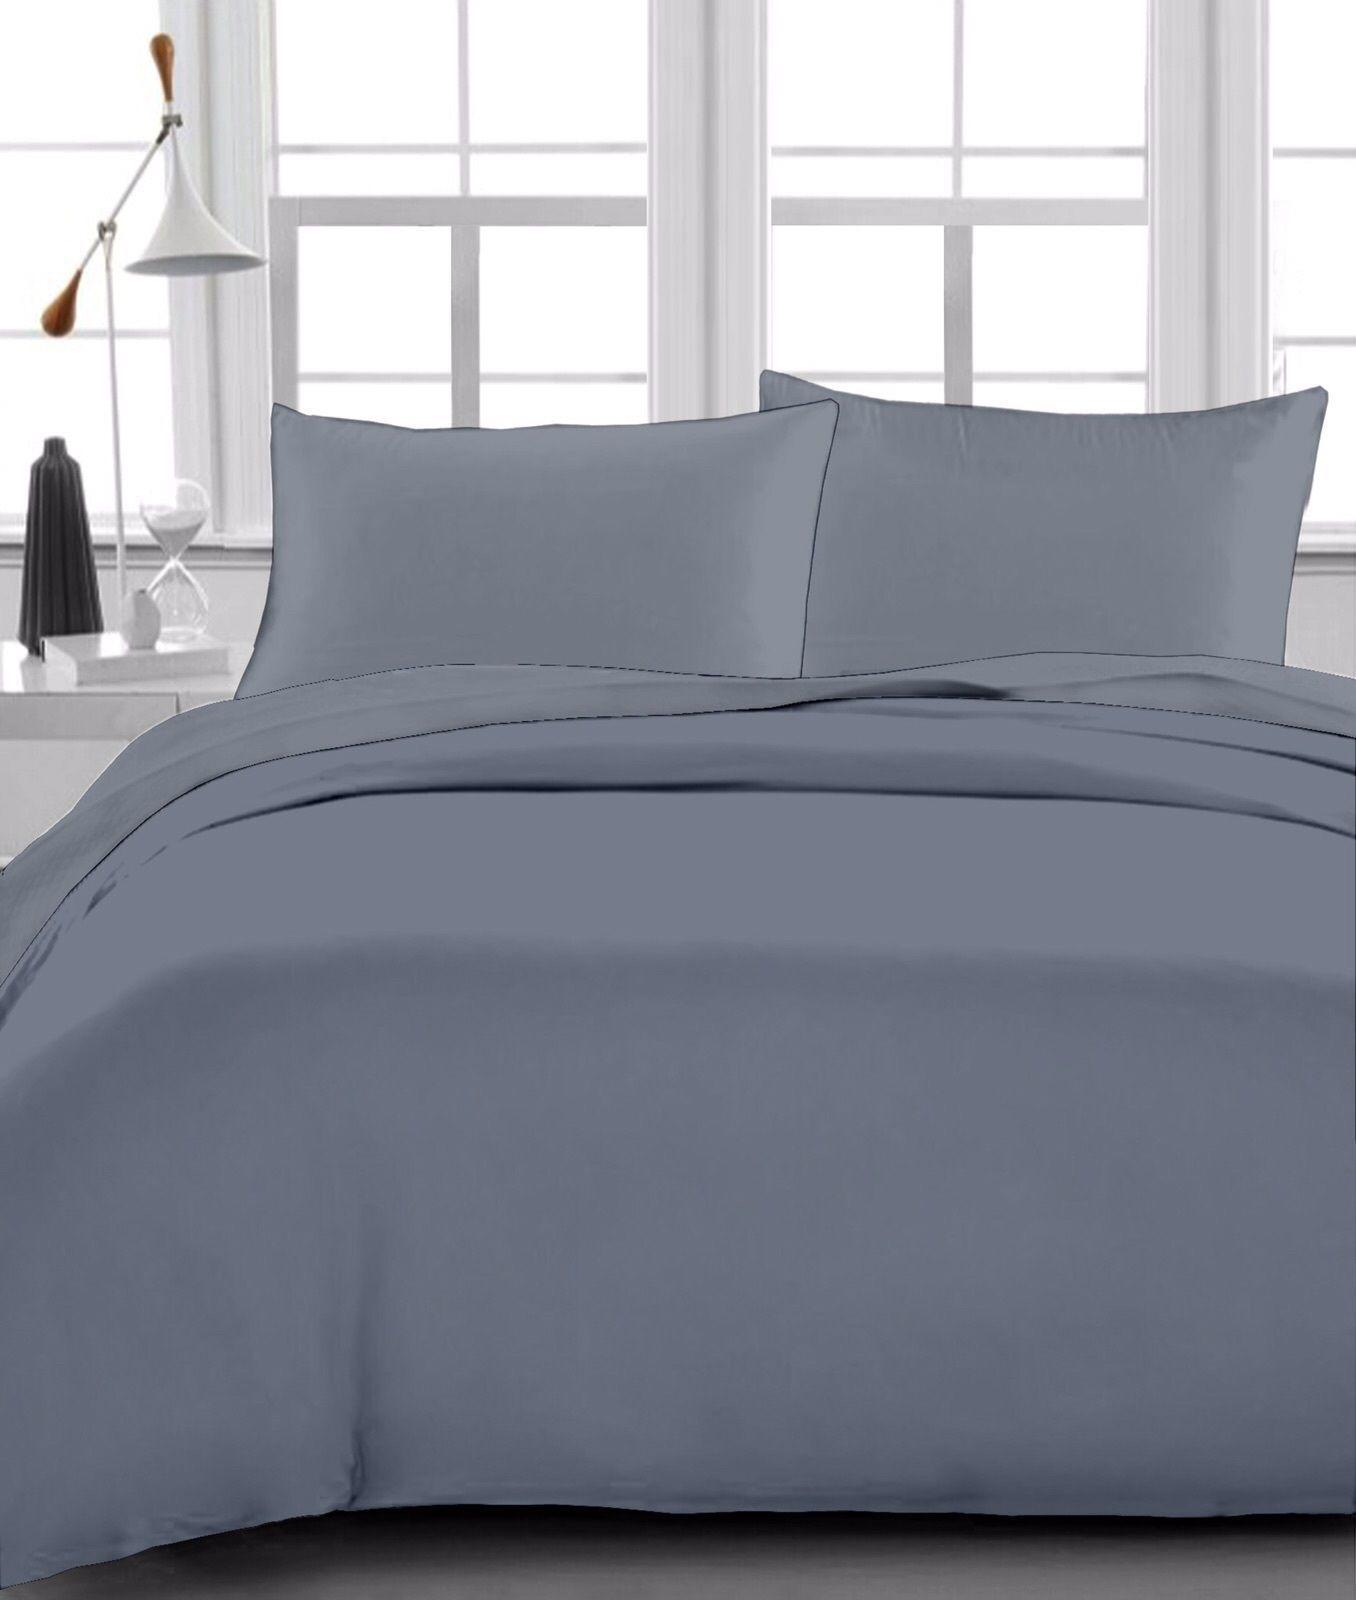 Luxurious Bedding Set White Stripe Pure Egyptian Cotton 1000-TC 15 Inch Drop